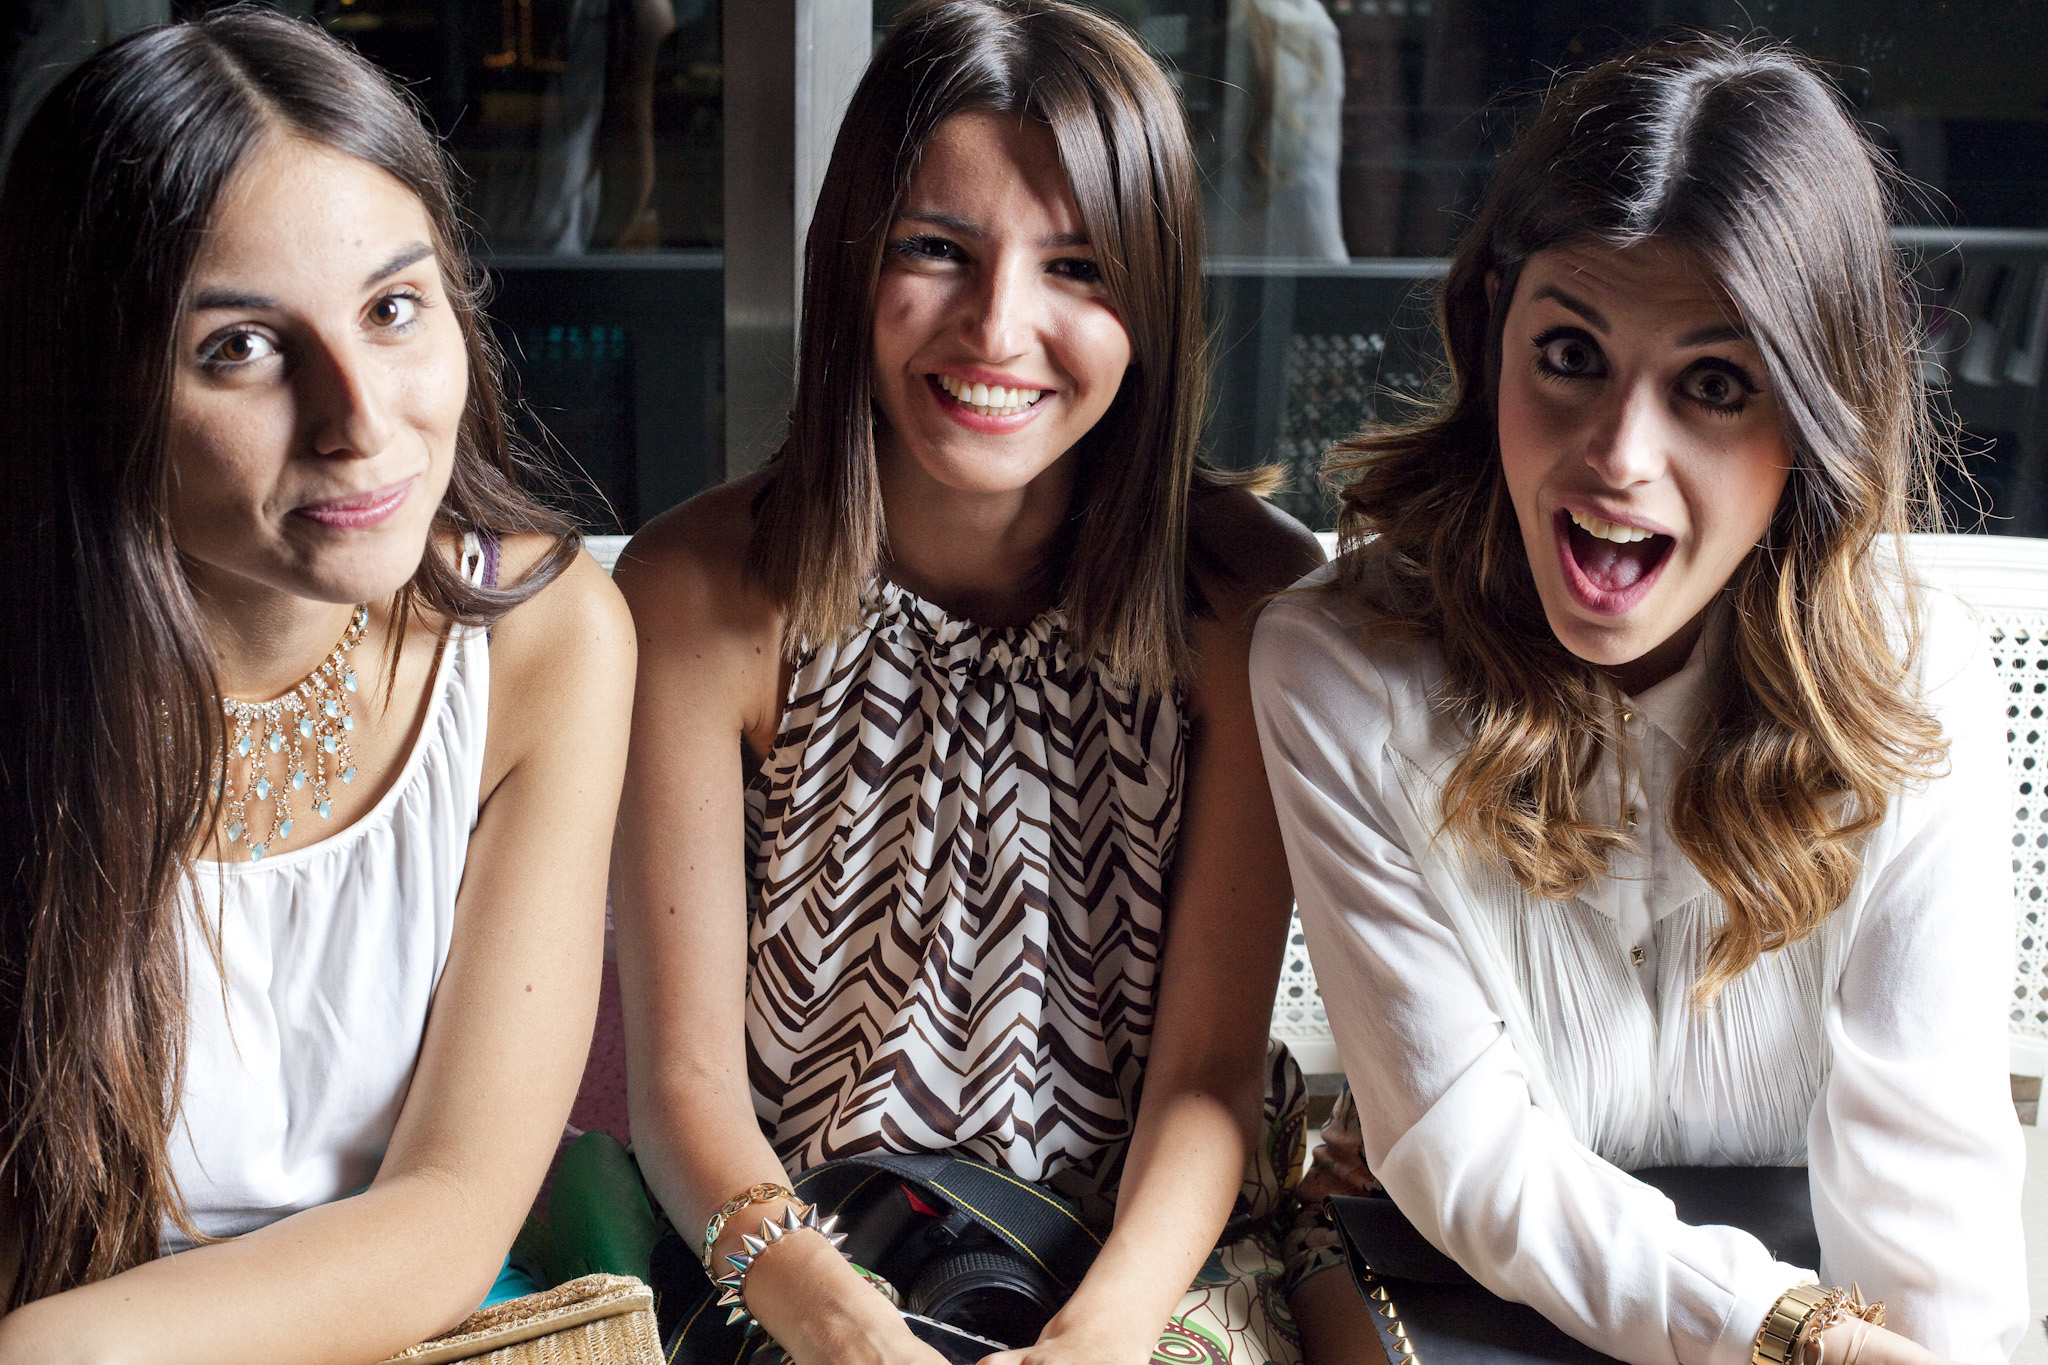 Era from Allt That She Wants, Alejandra from Lovely Pepa and Aida from Dulceida